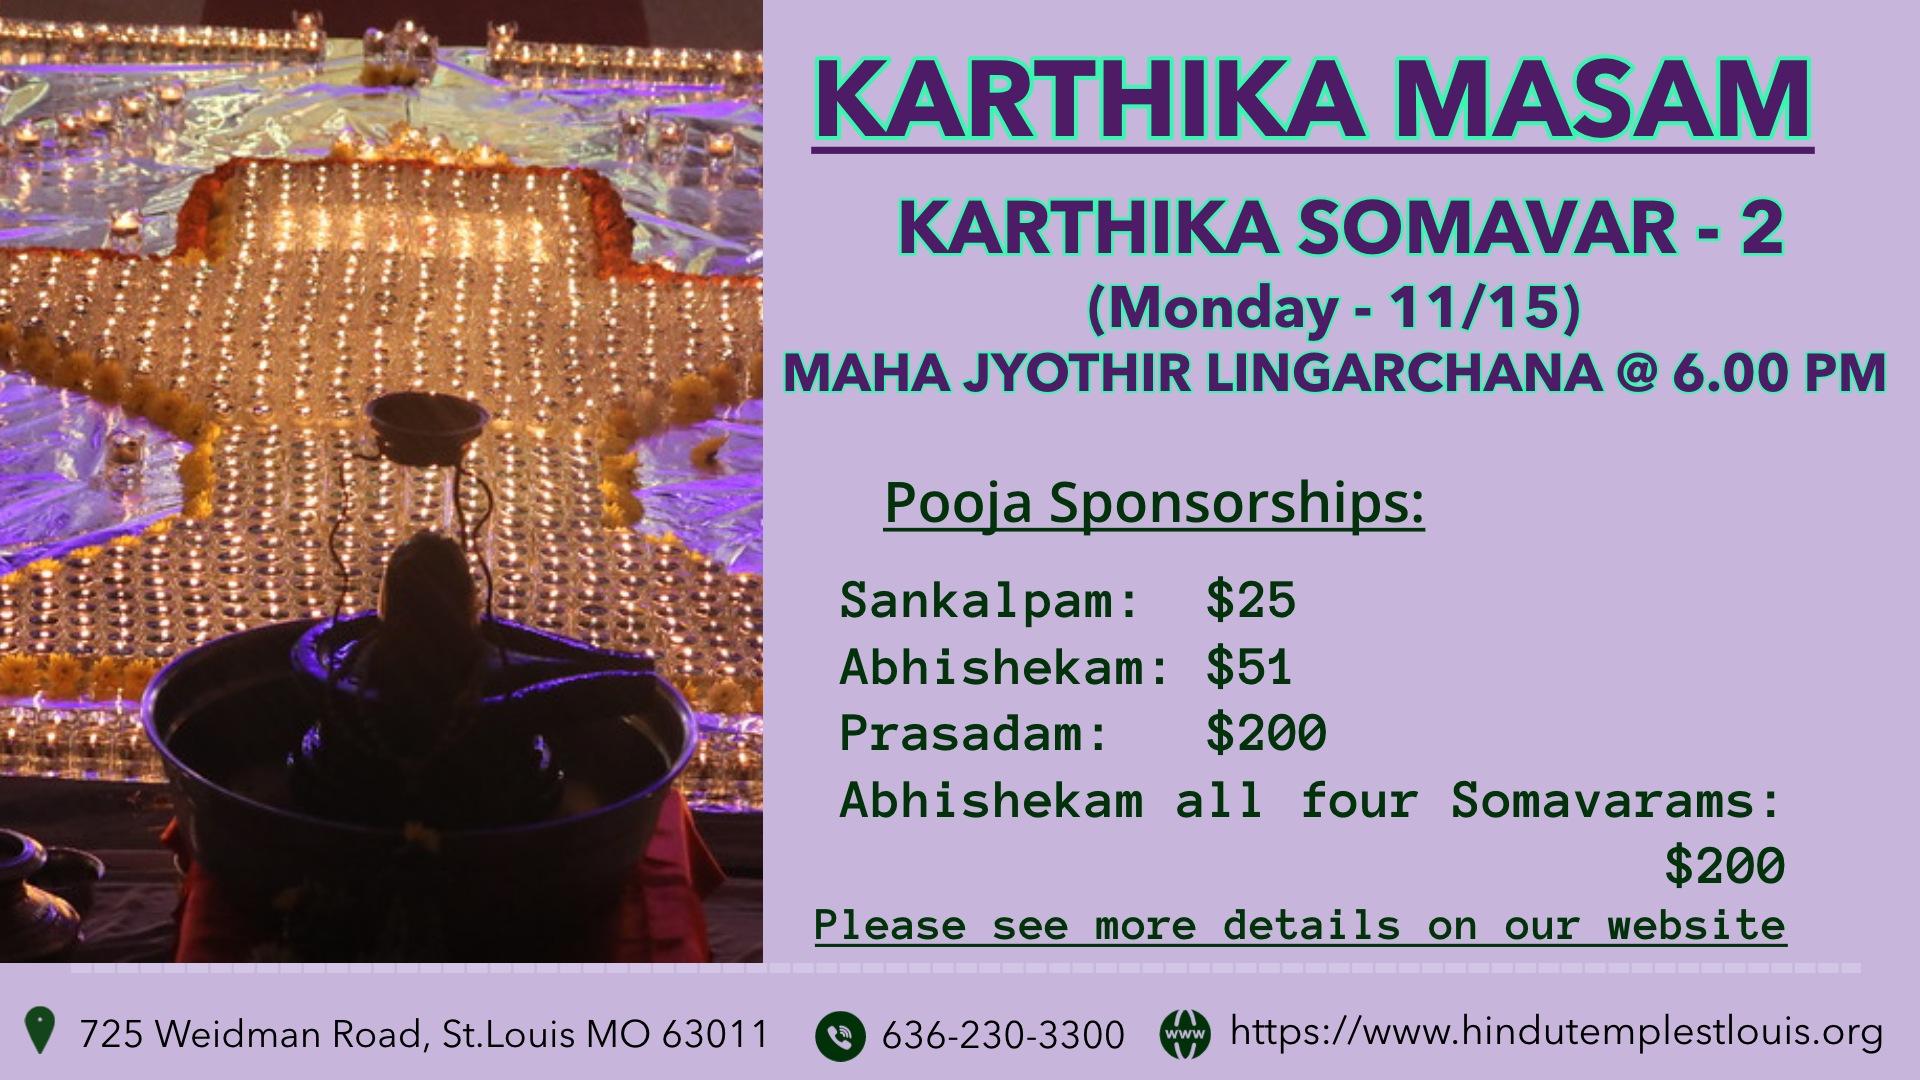 KARTHIKA MASAM (SOMAVAR-2) @ 11/15, 6.00 PM